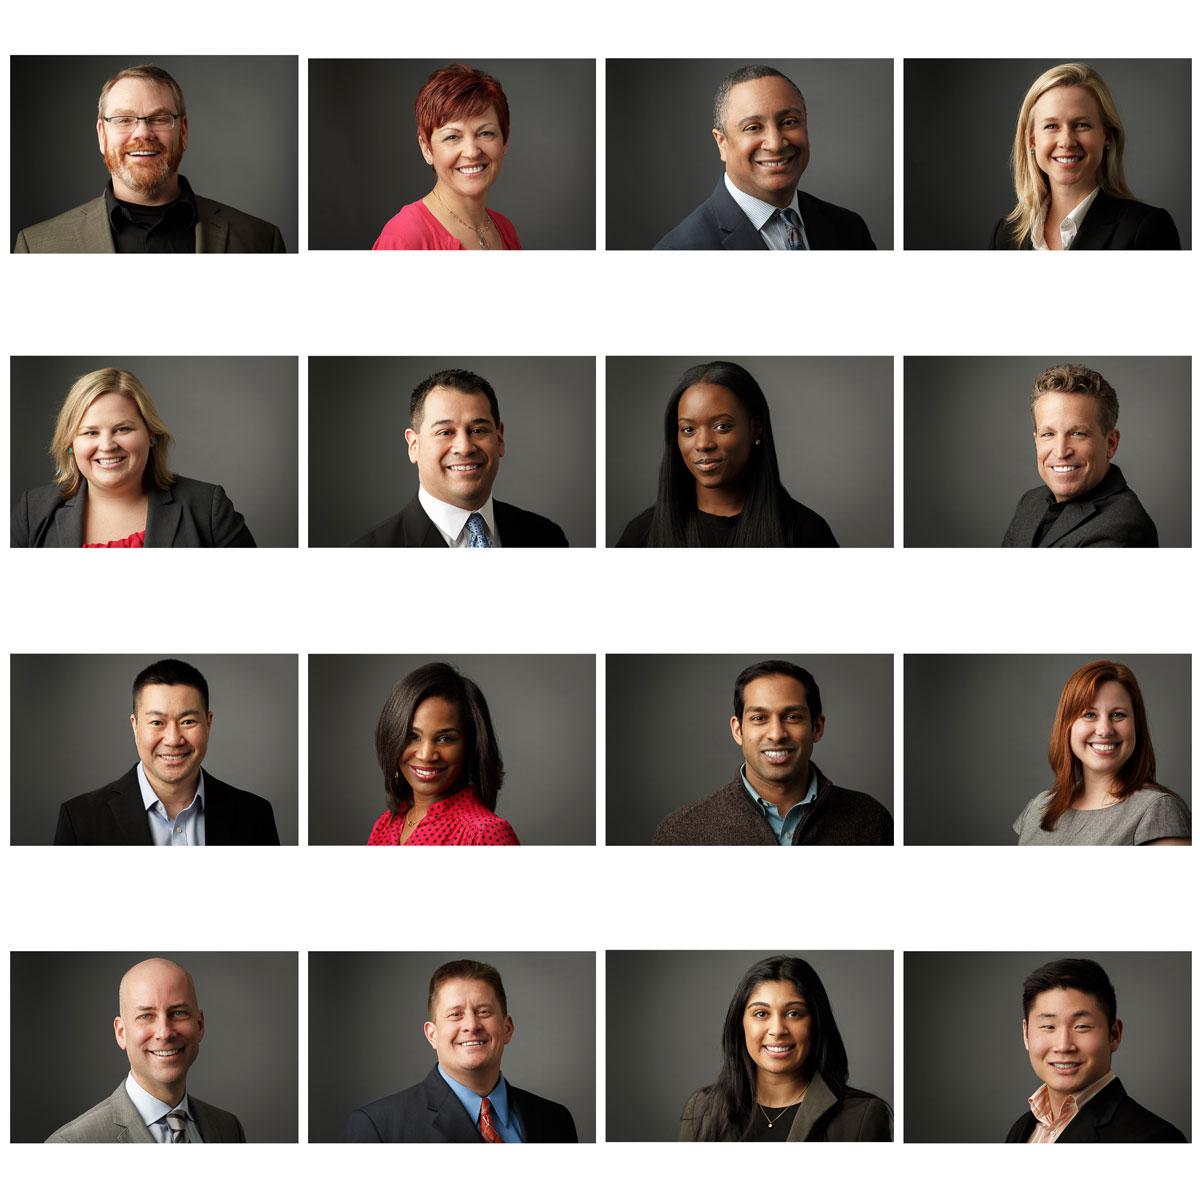 Chicago Business Headshot Photographer